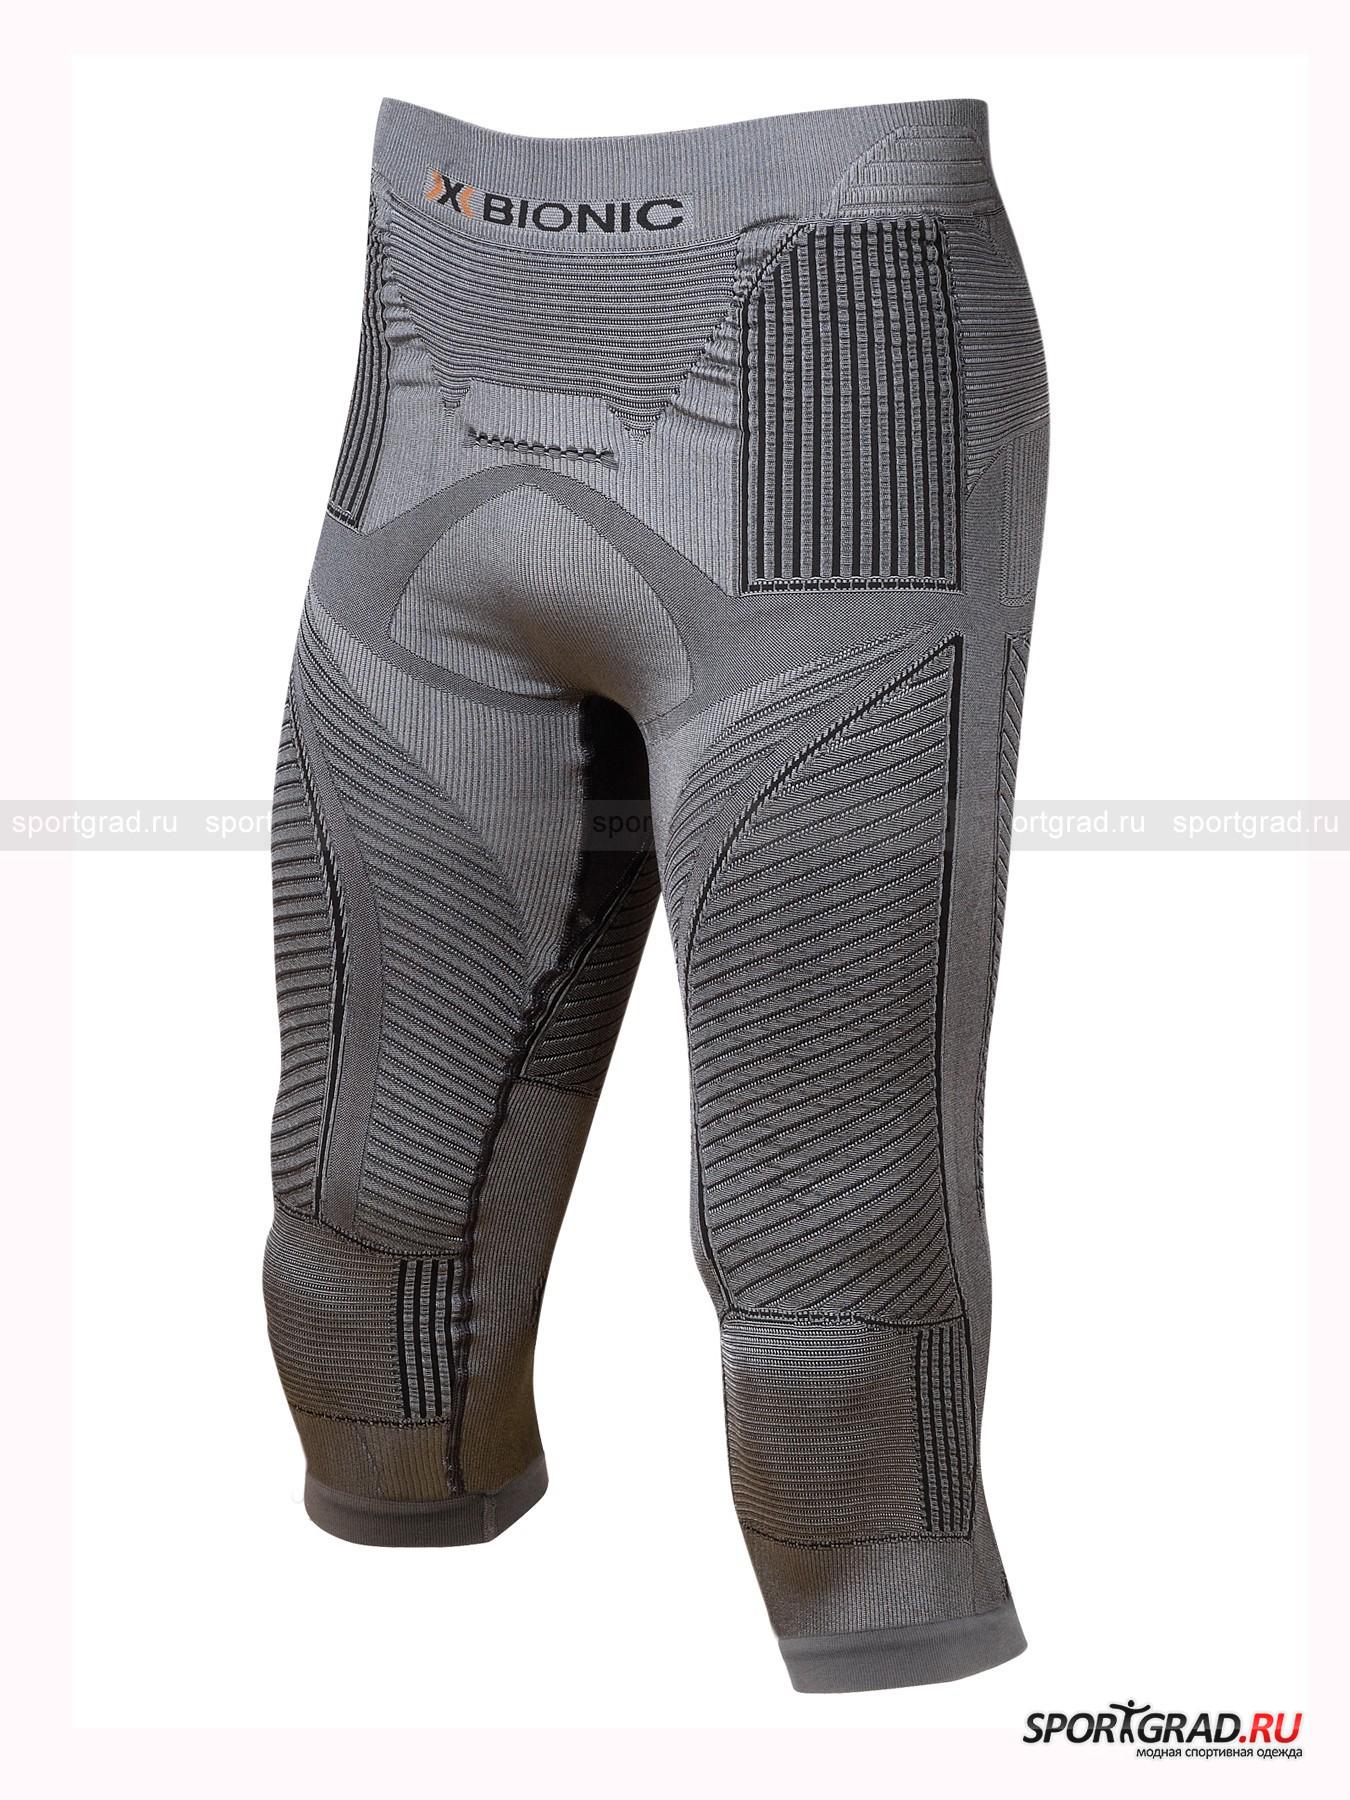 Белье: термобриджи мужские Pants Med RADIACTOR X-BIONIC для занятий спортом